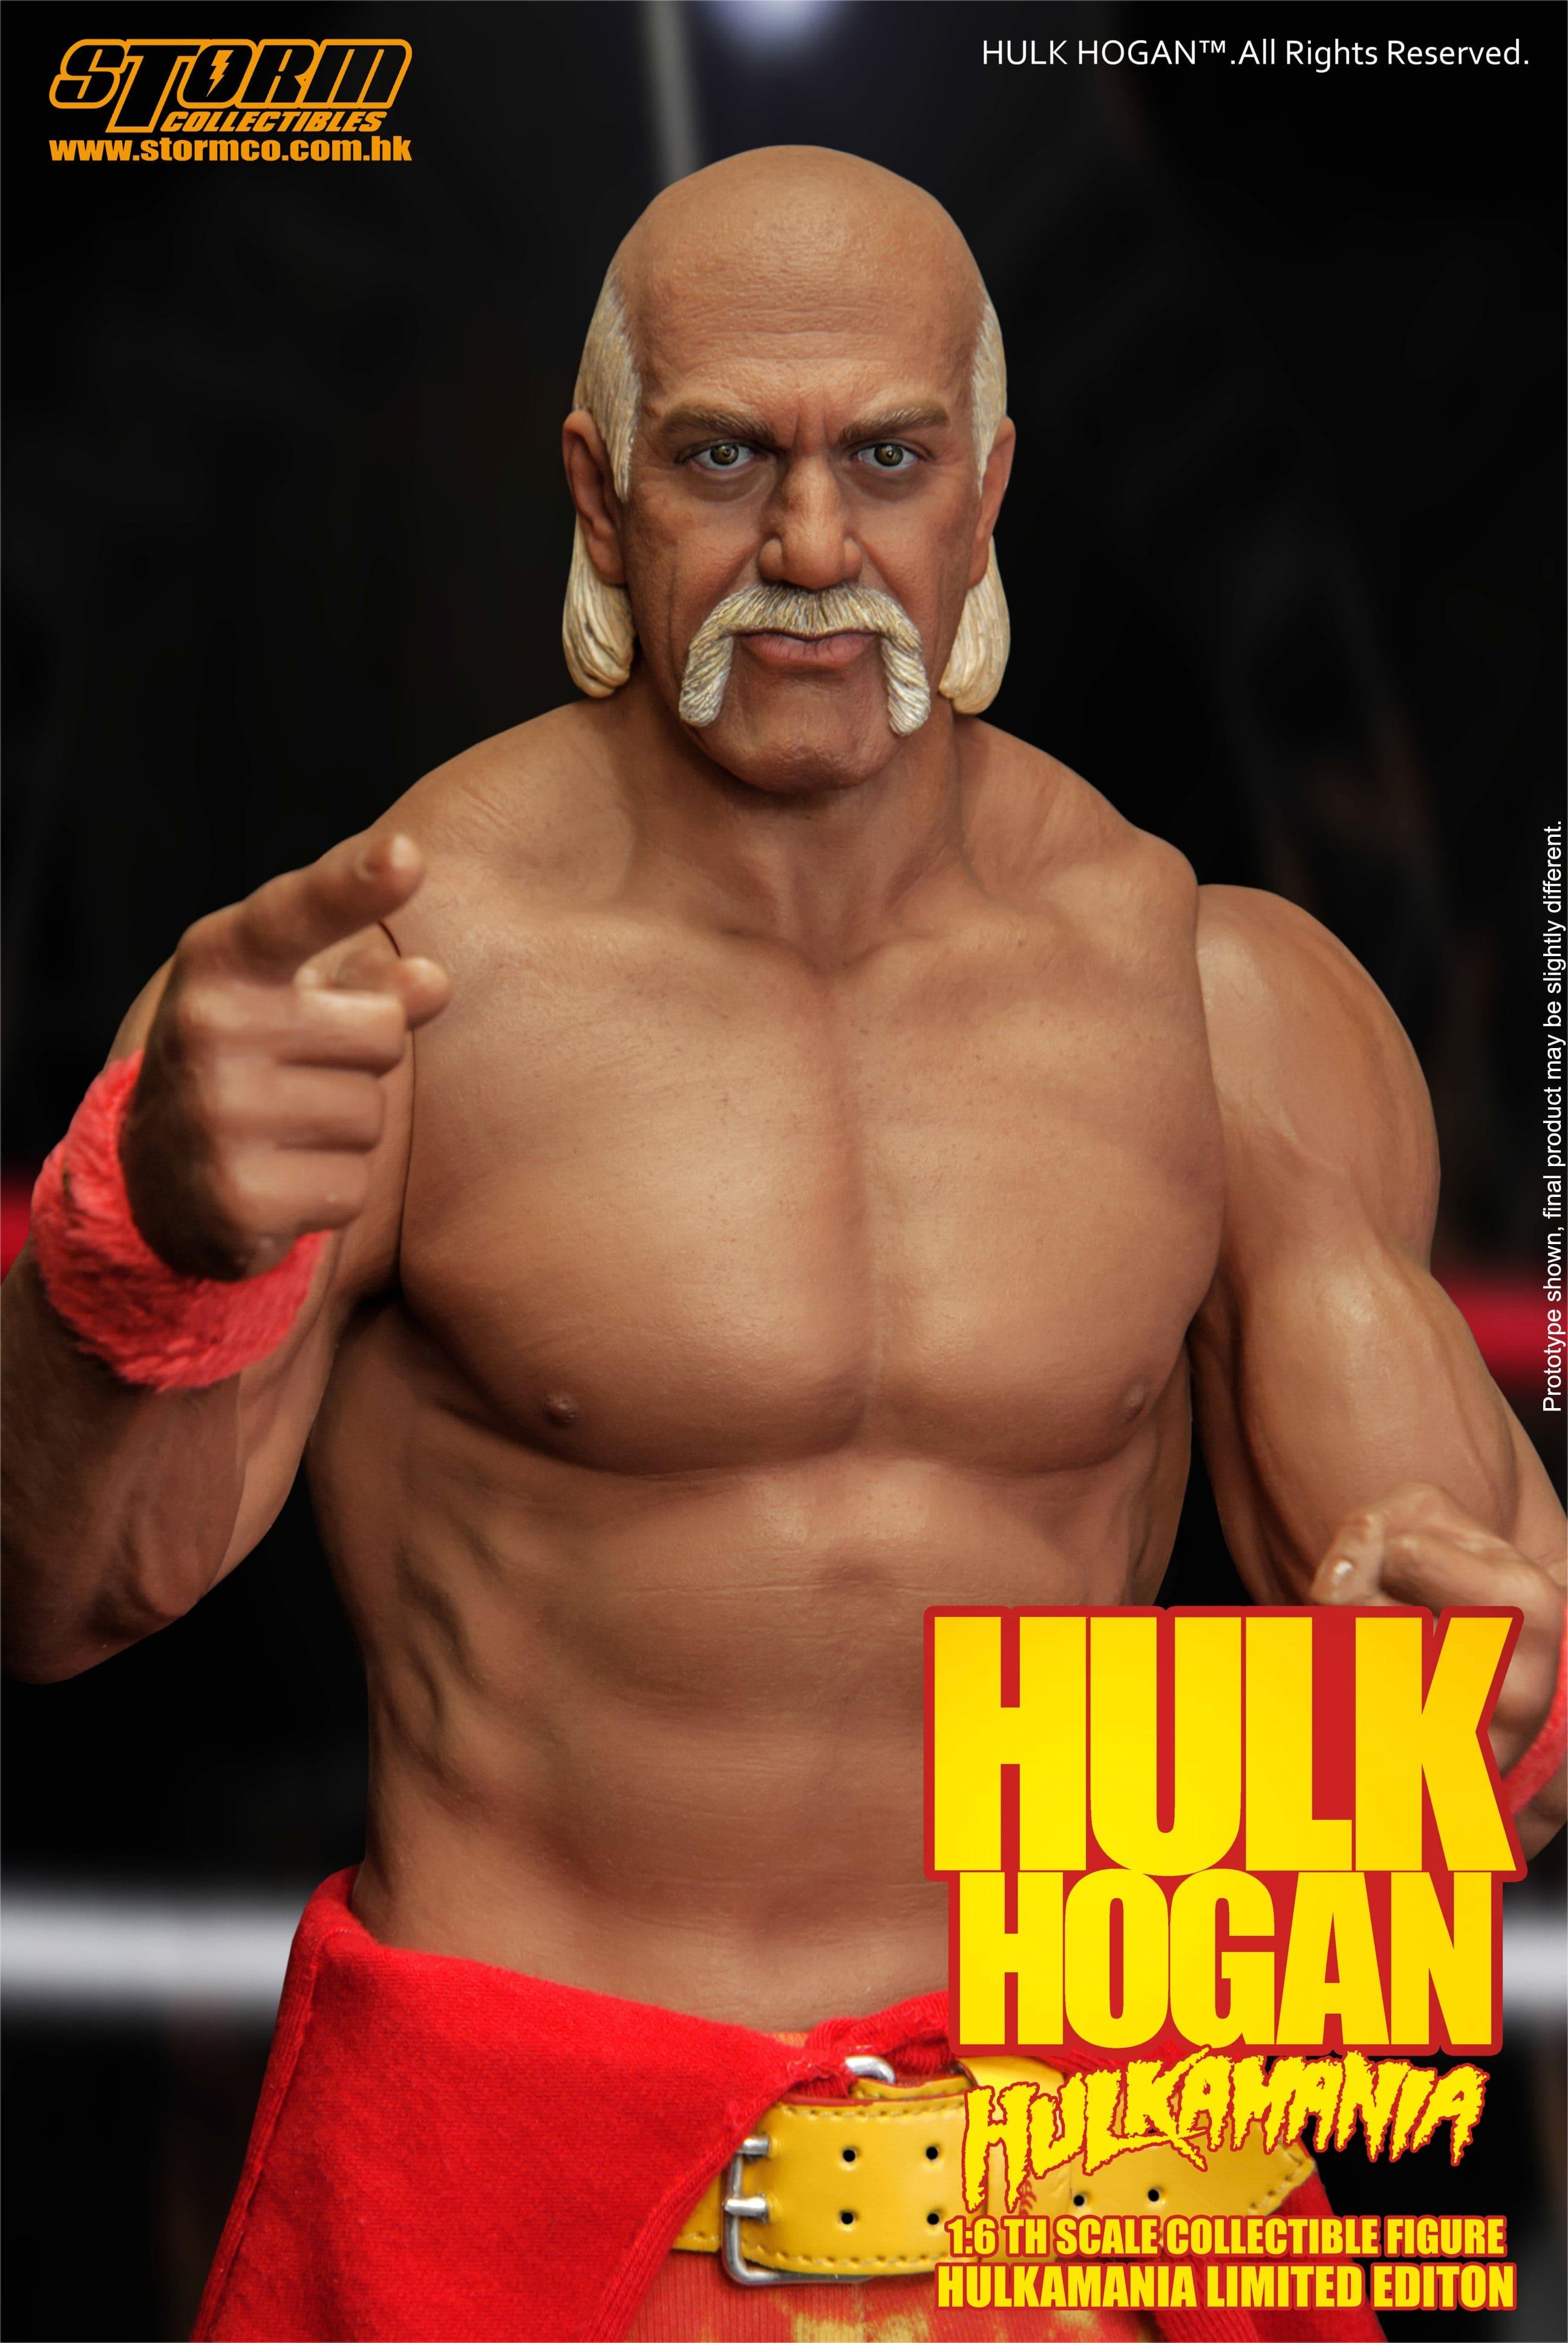 Hulk hogan celebrity championship wrestling online